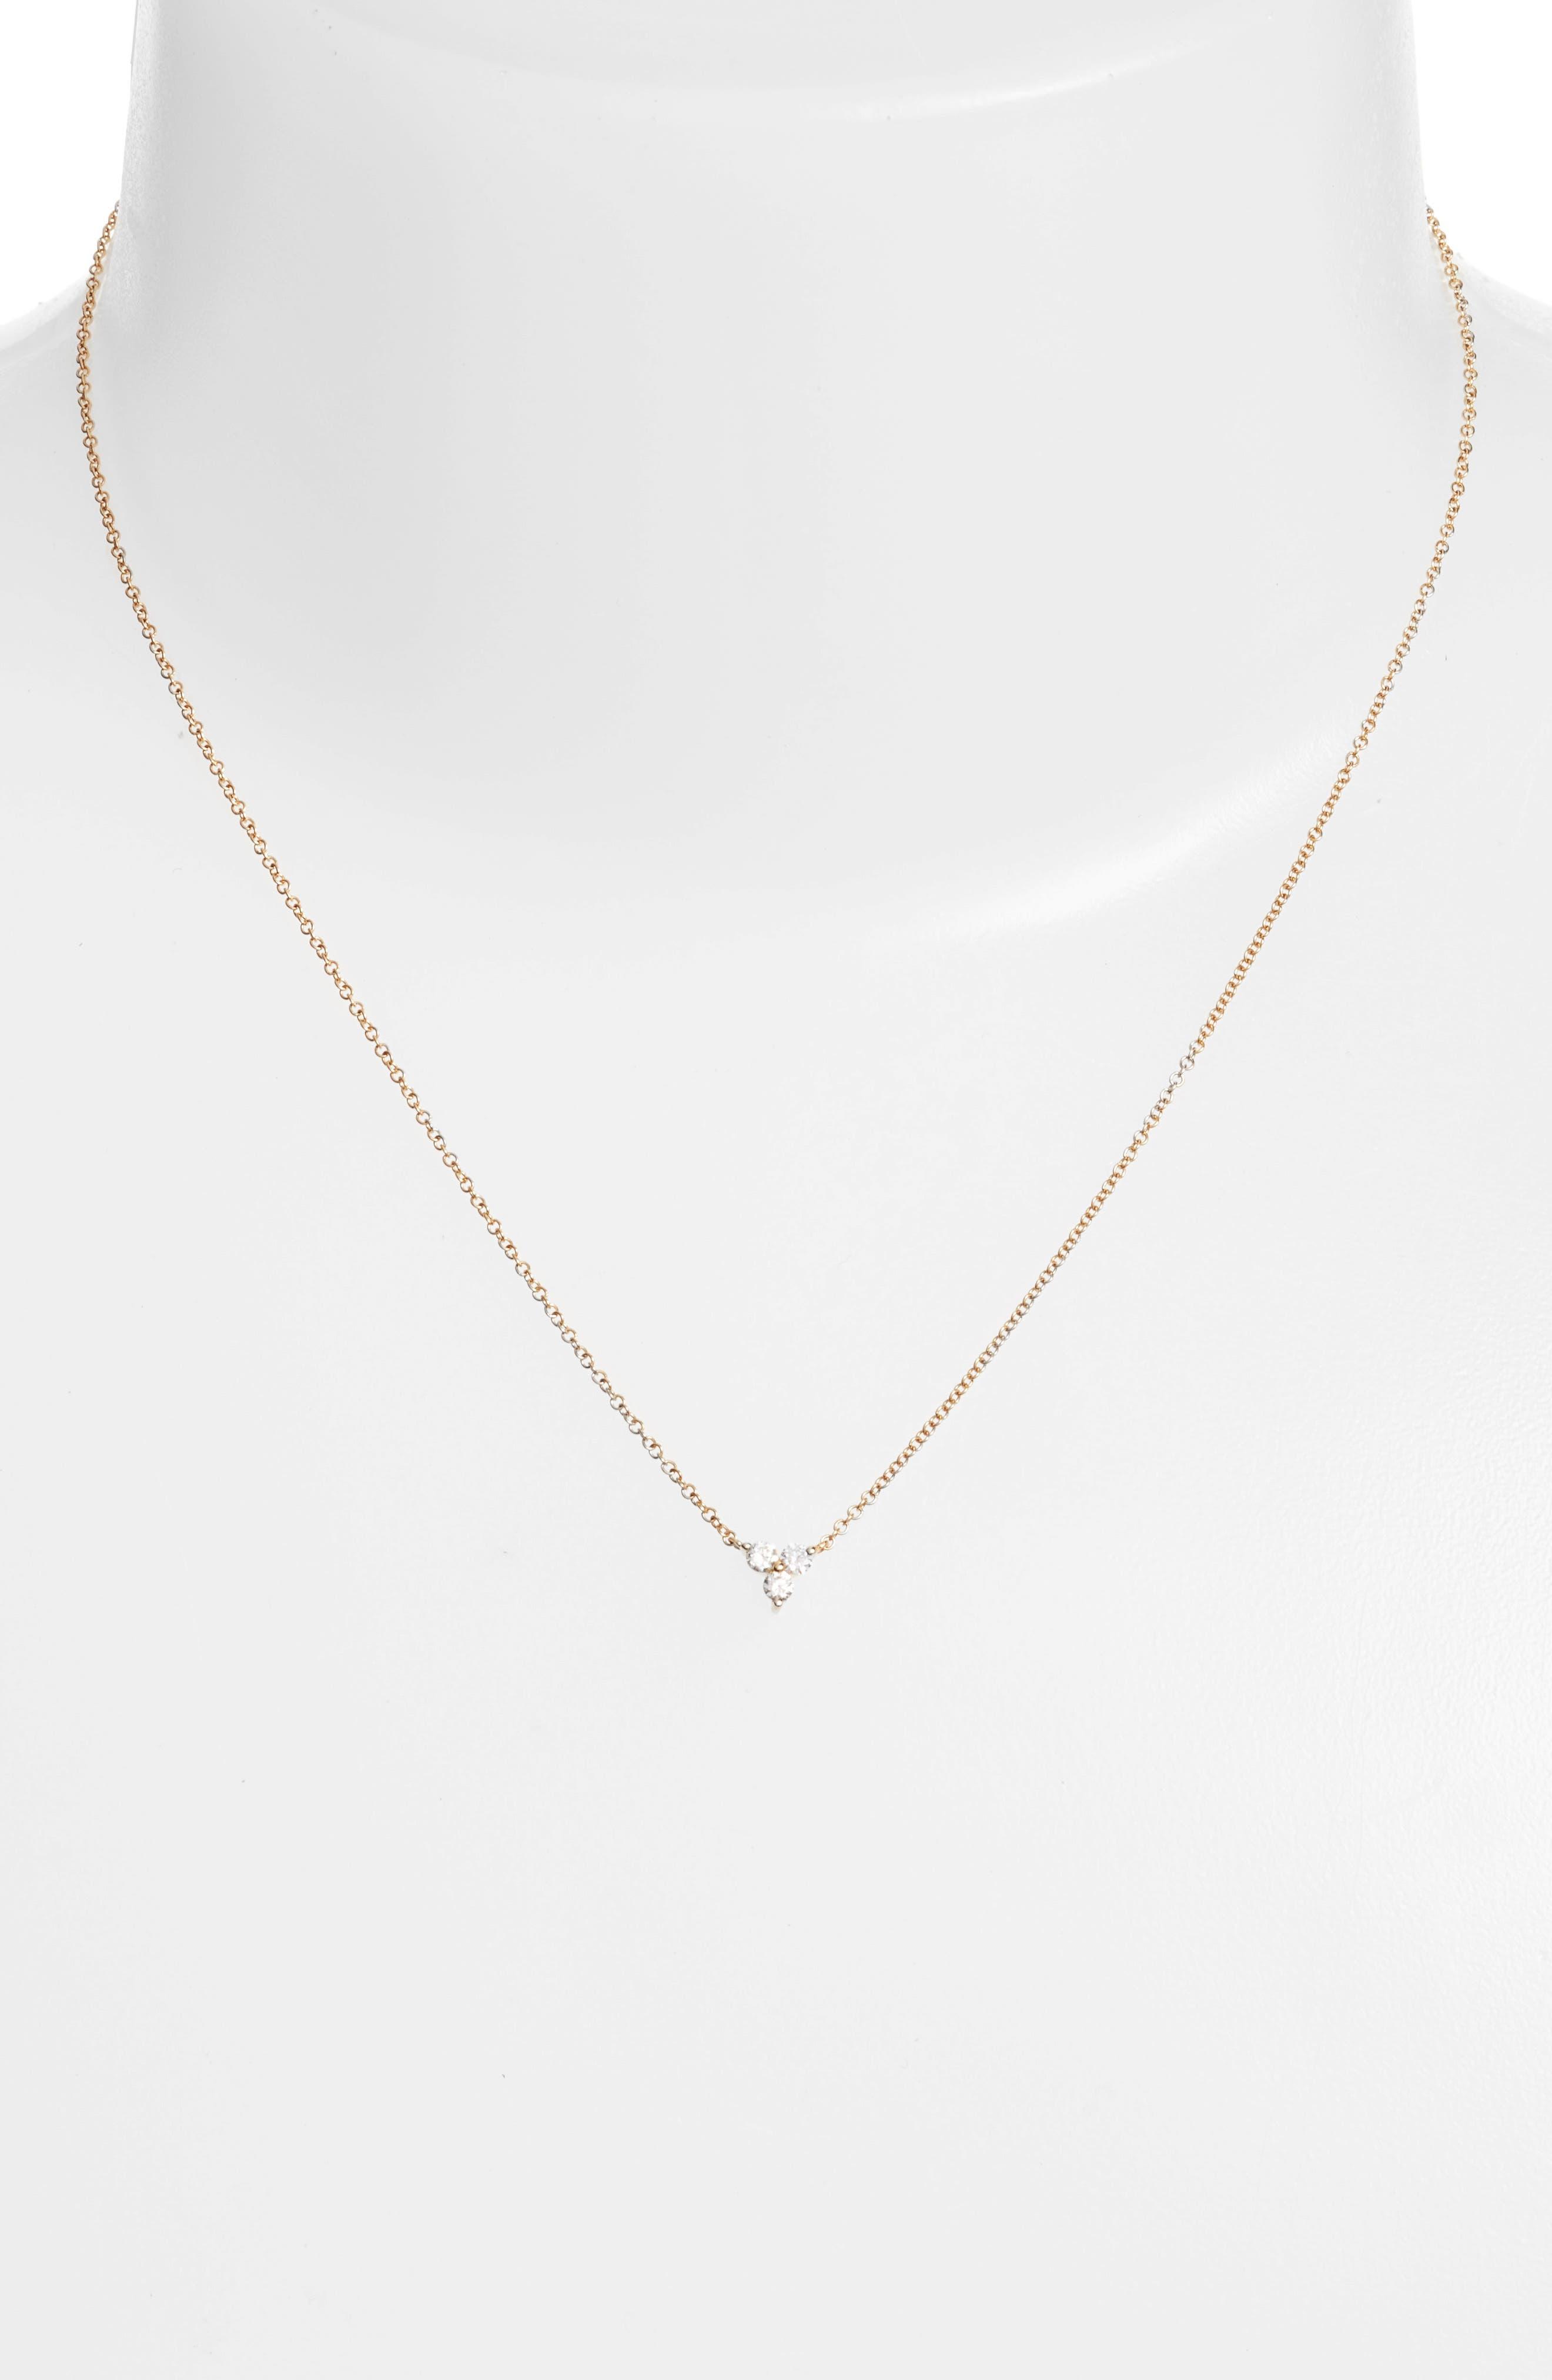 Trio Diamond Pendant Necklace,                             Alternate thumbnail 2, color,                             Yellow Gold